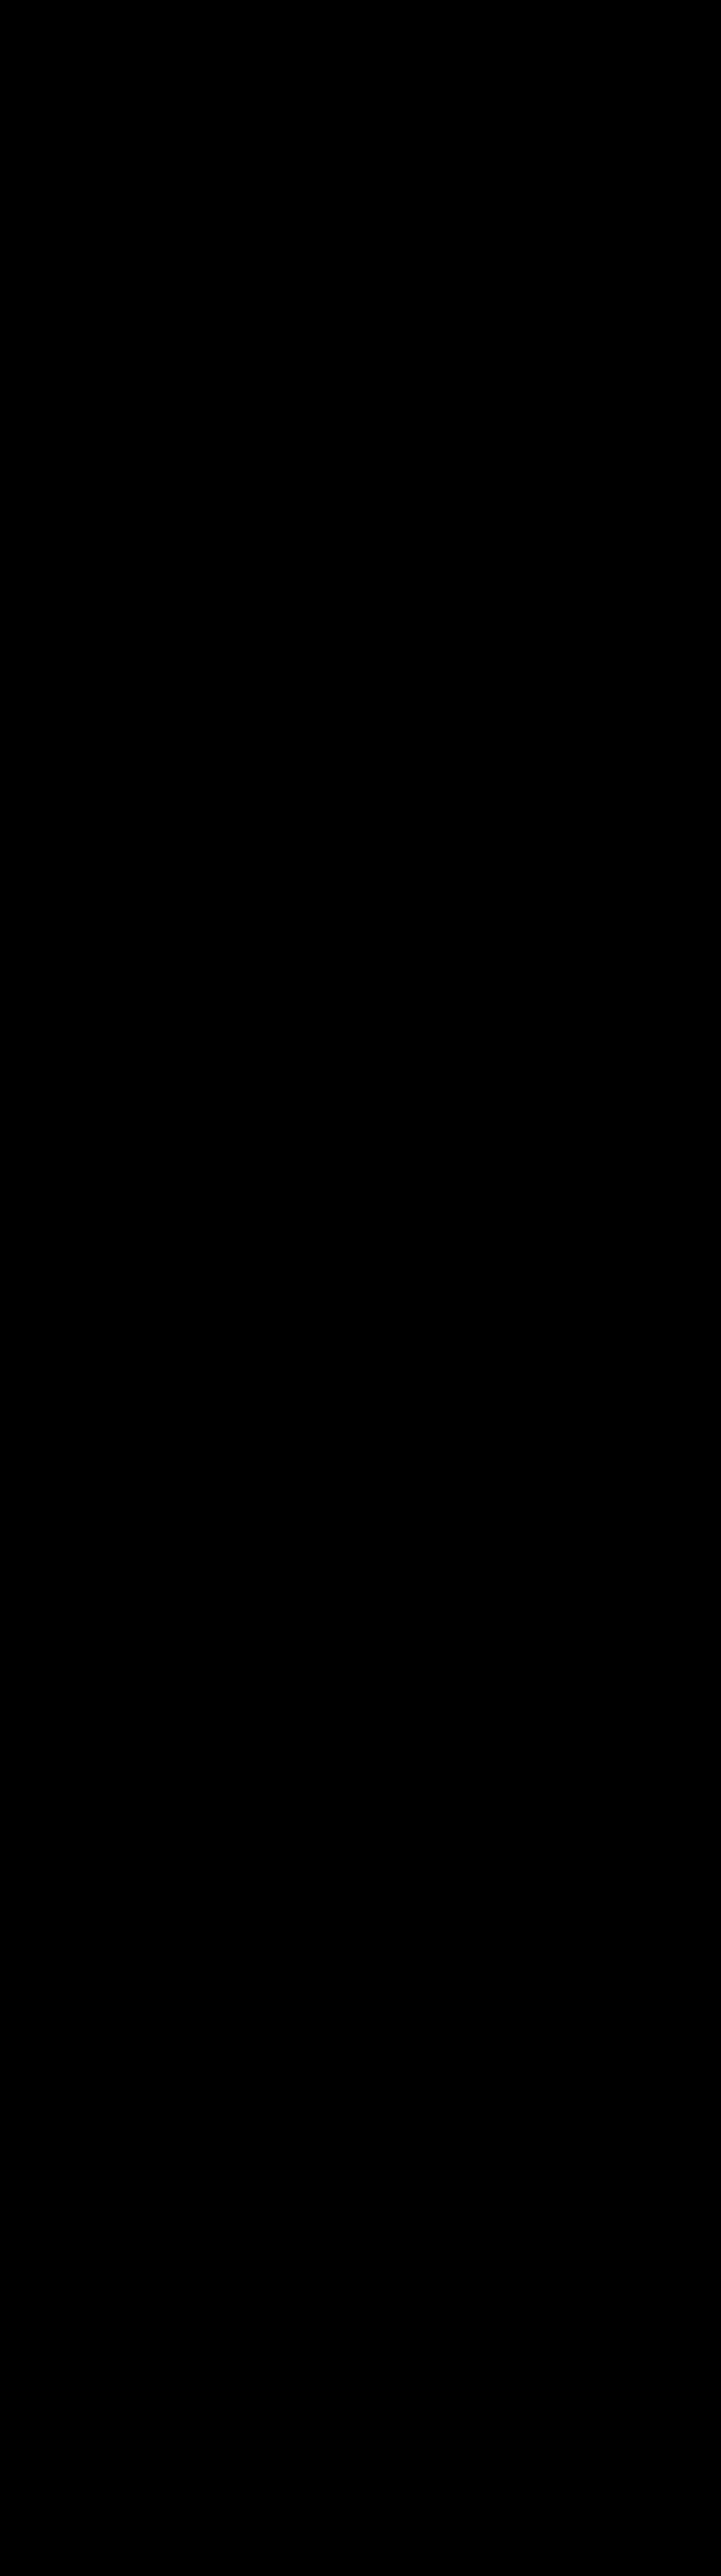 2000x7149 Bracket Clip Art